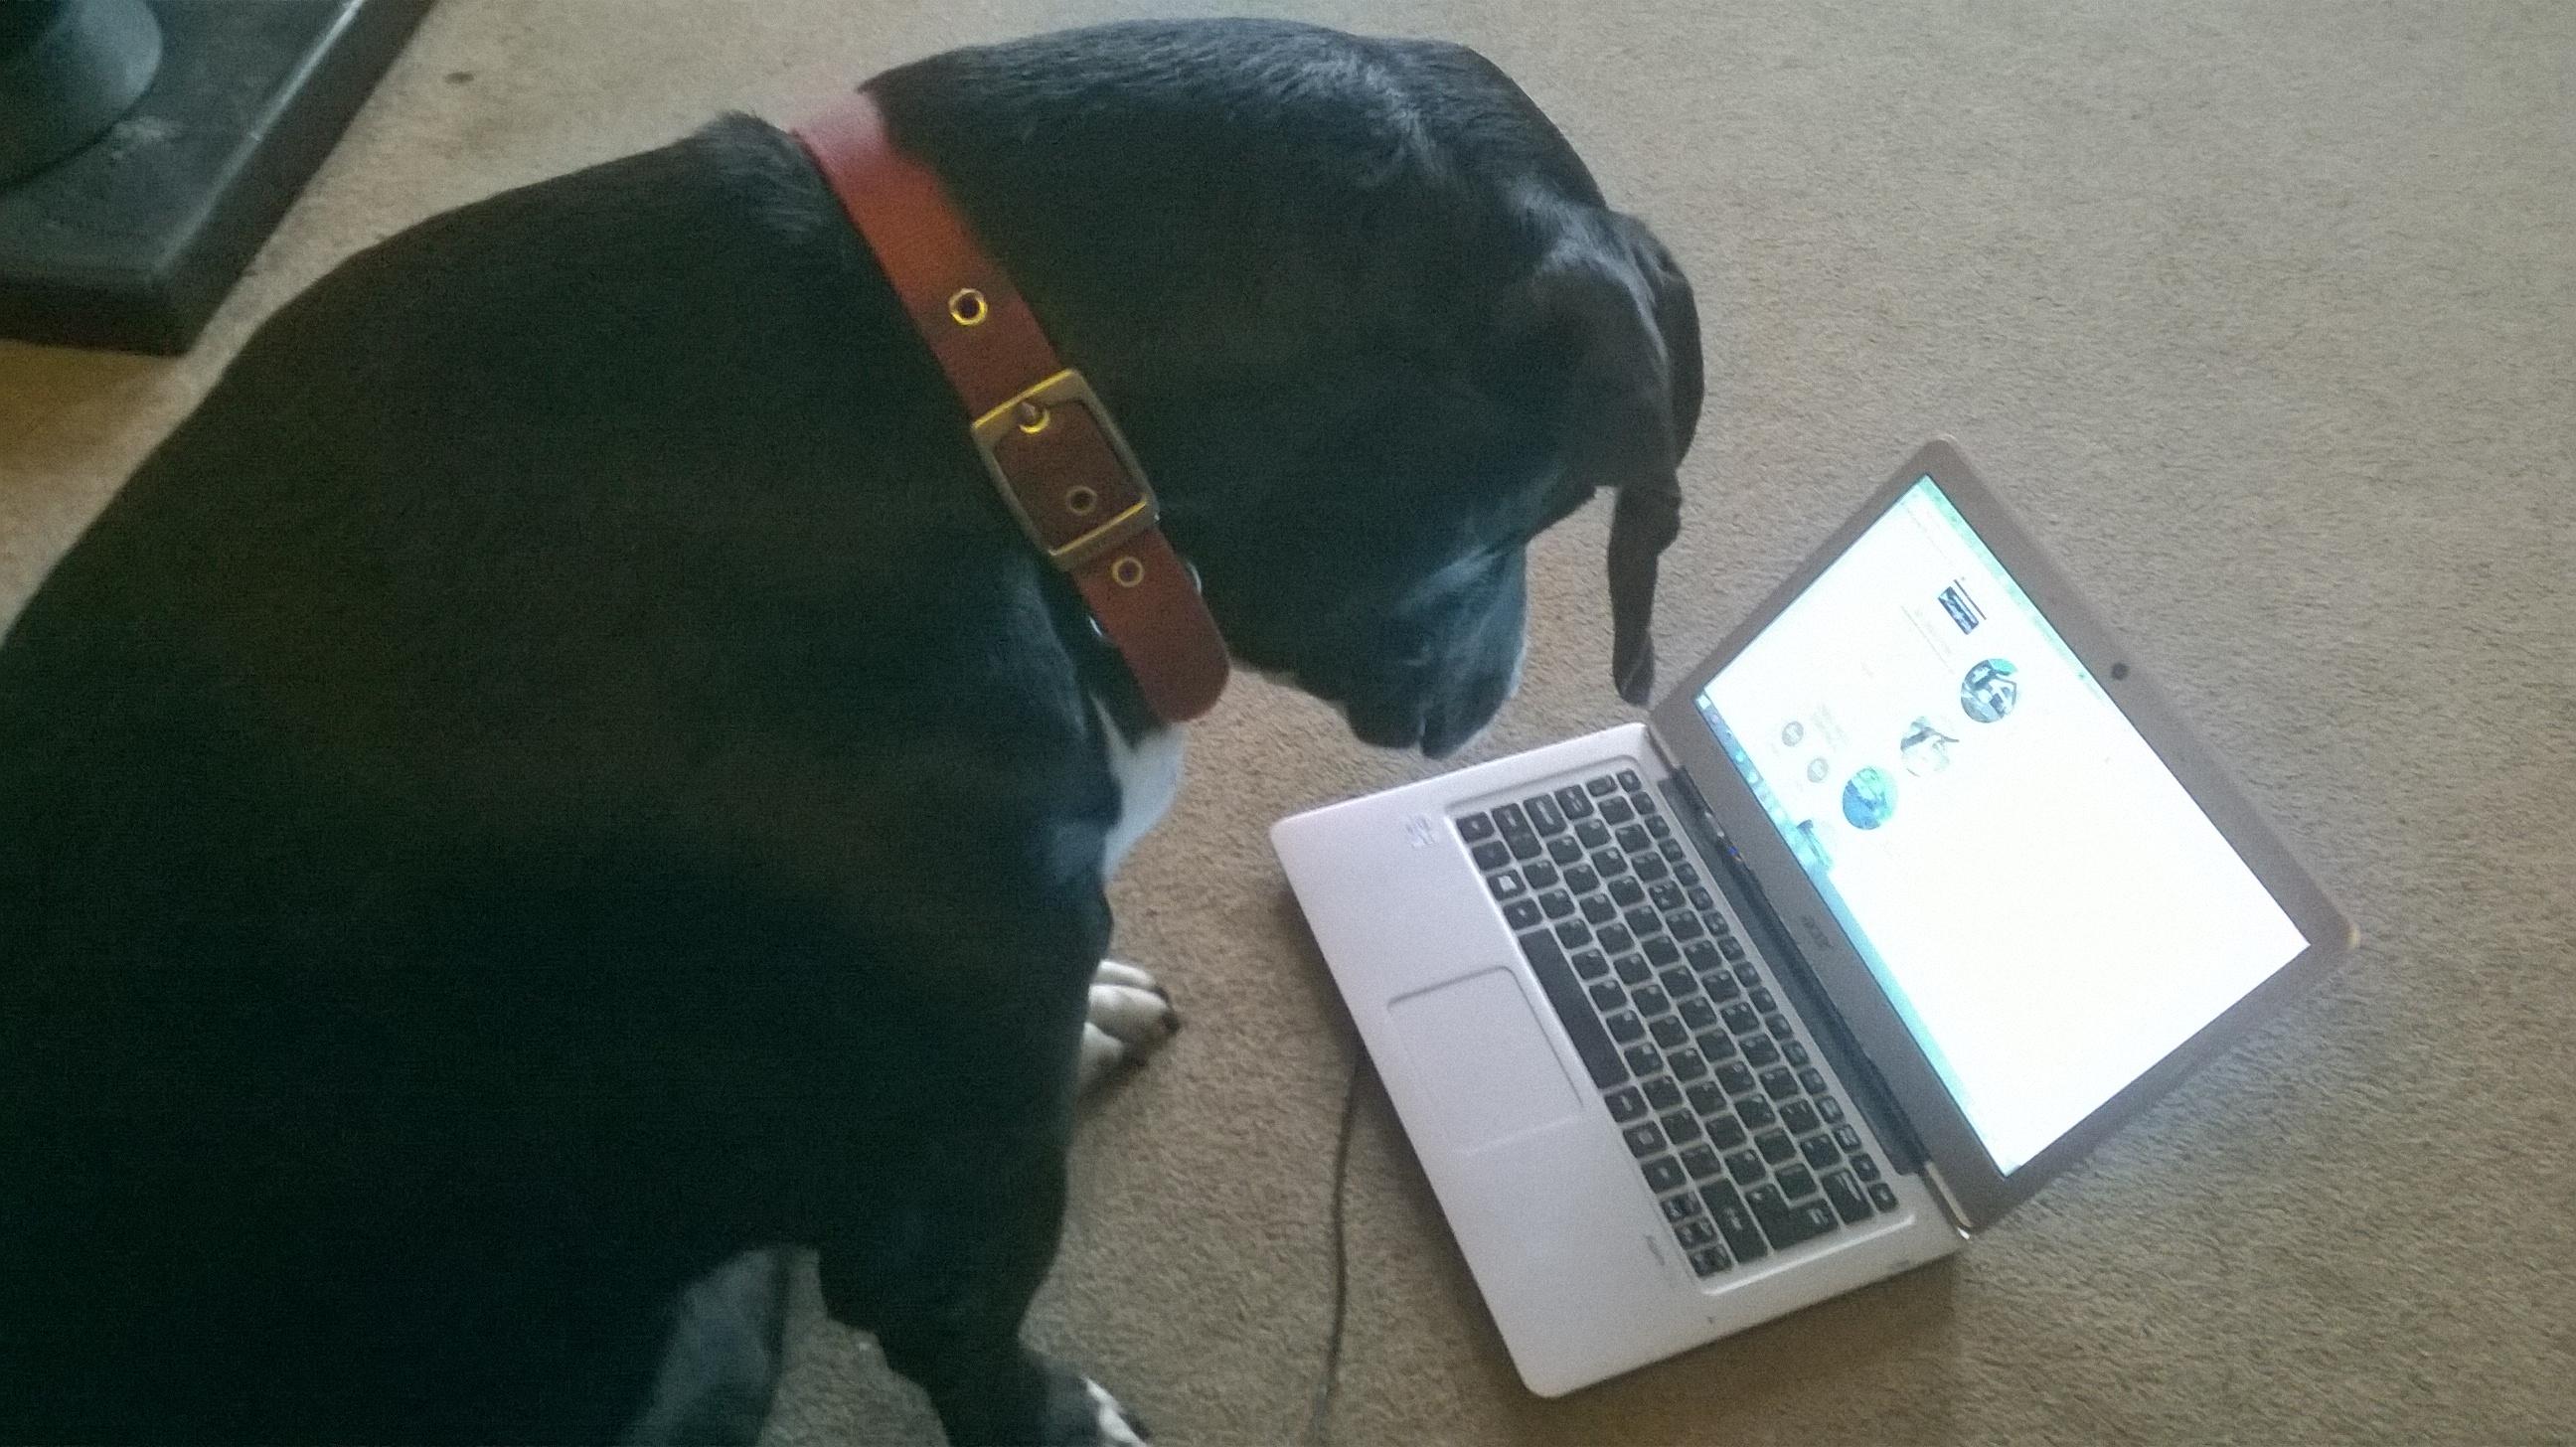 Social media addiction - Katie Hale, Cumbrian poet, writer and artist